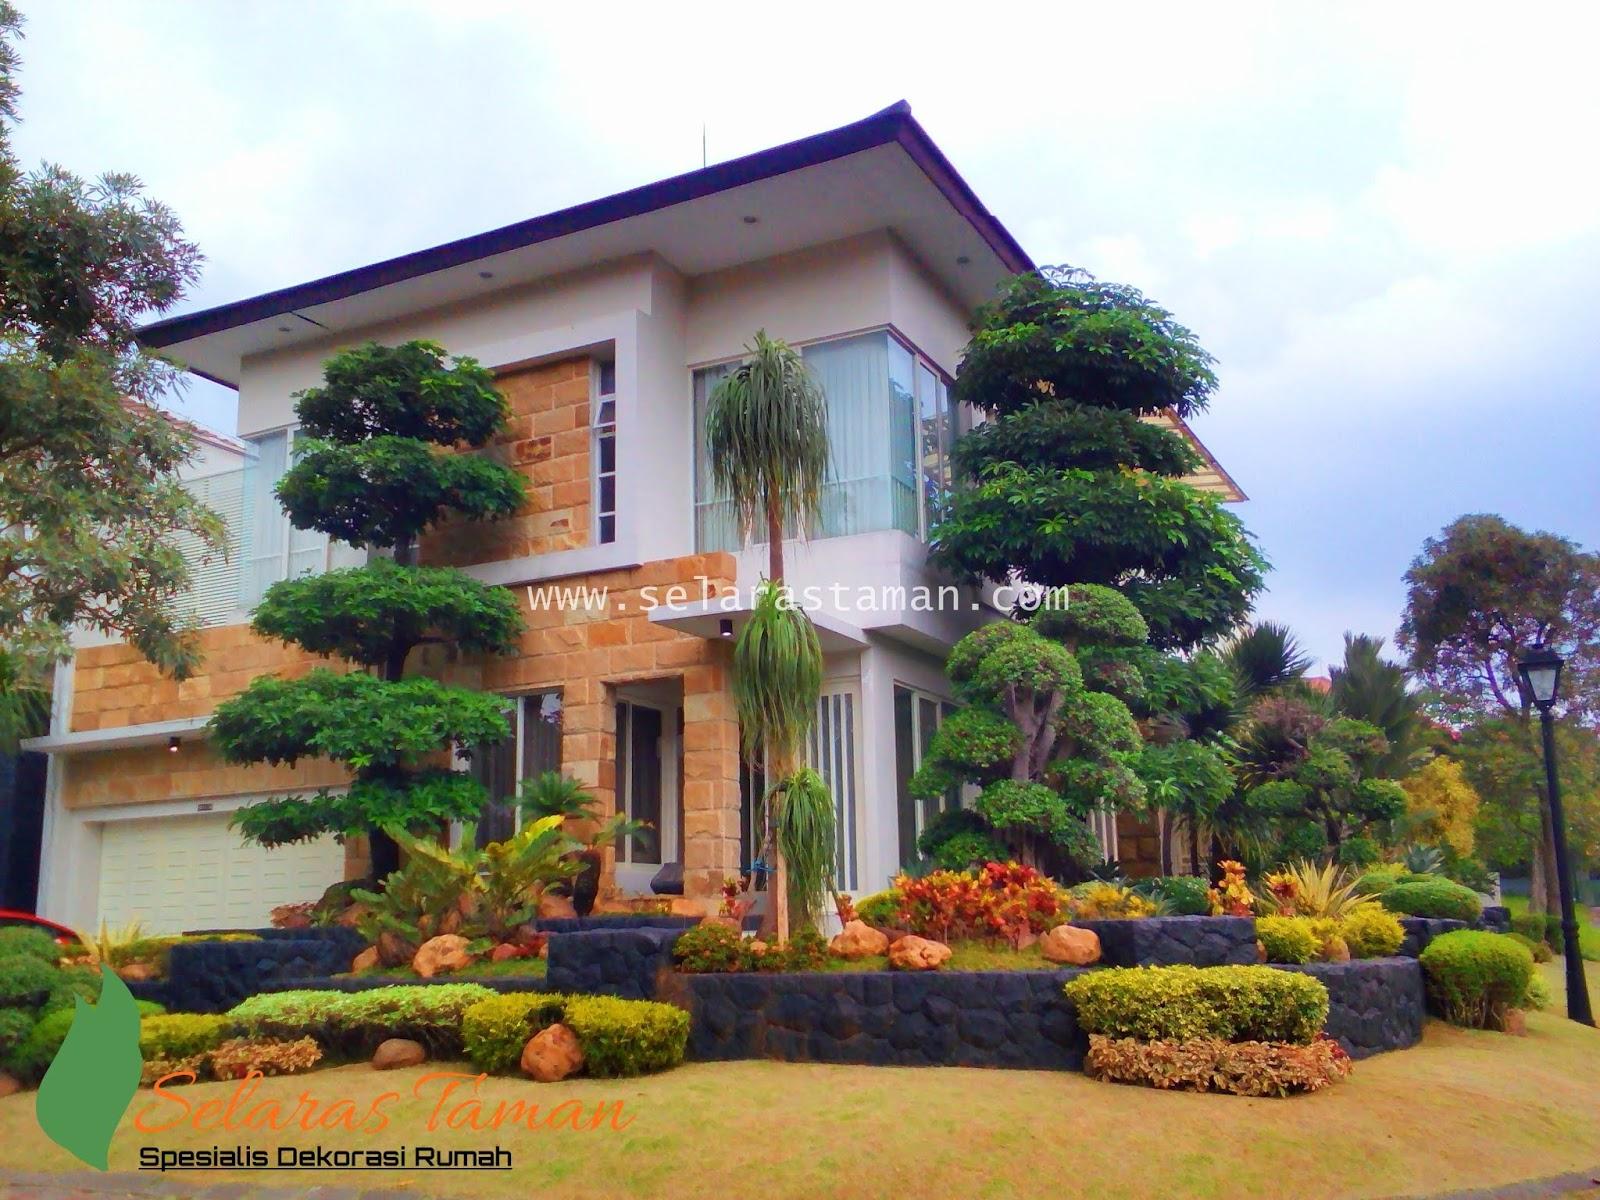 Tukang Taman Sidoarjo Jasa Pembuatan Taman Di Sidoarjo Selaras Taman Dekorasi Landscape